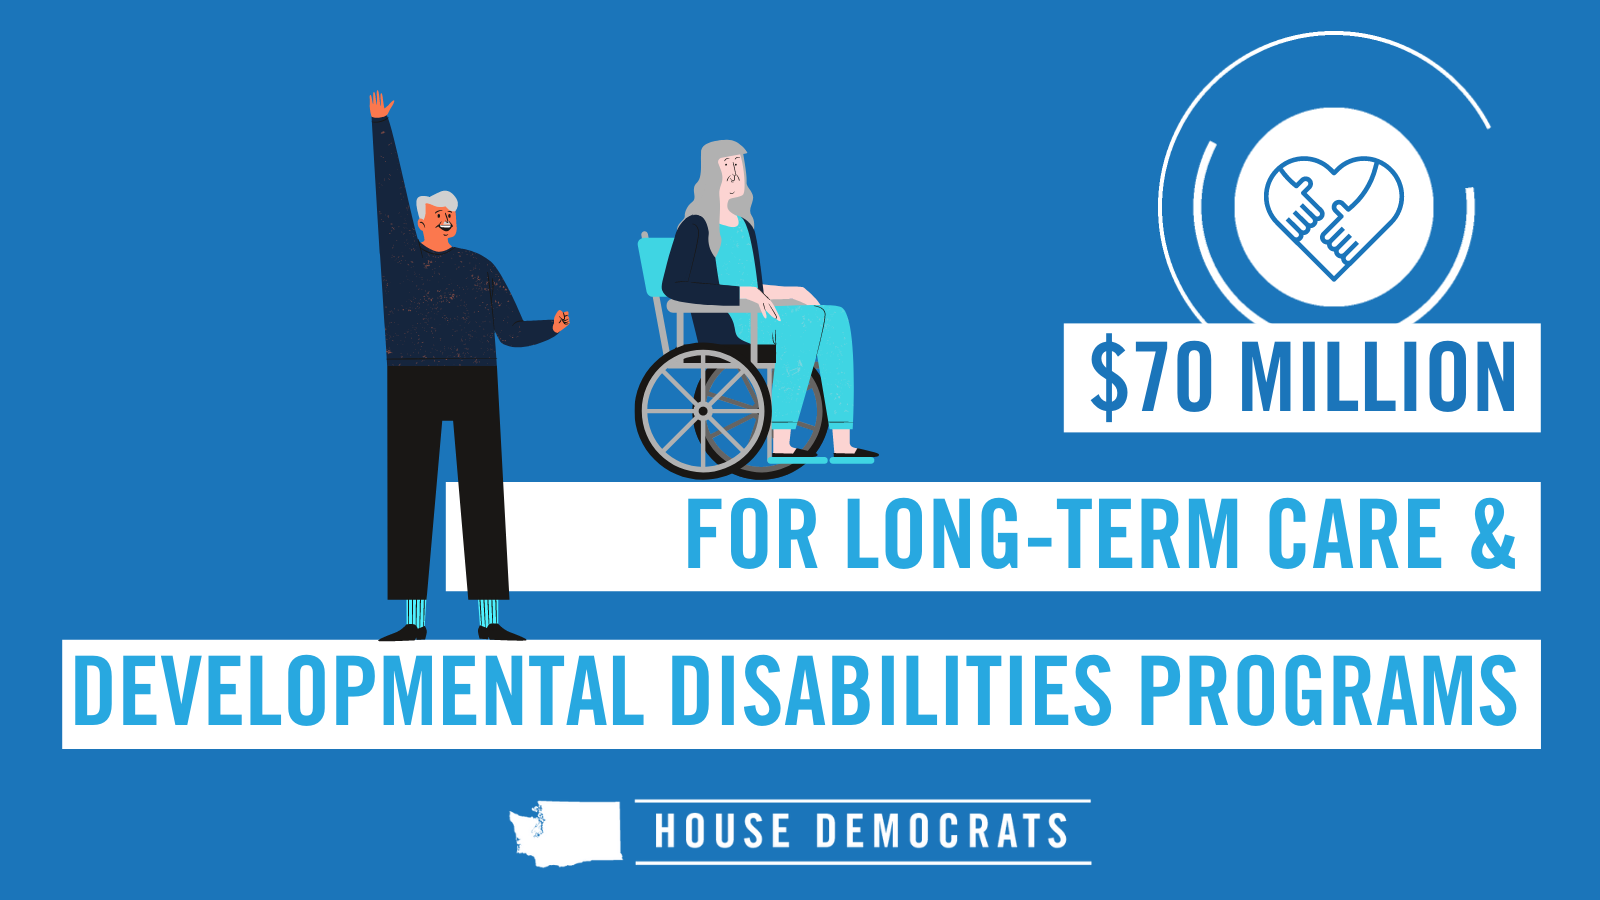 Slide that says $70 million for long-term care & developmental disabilities programs